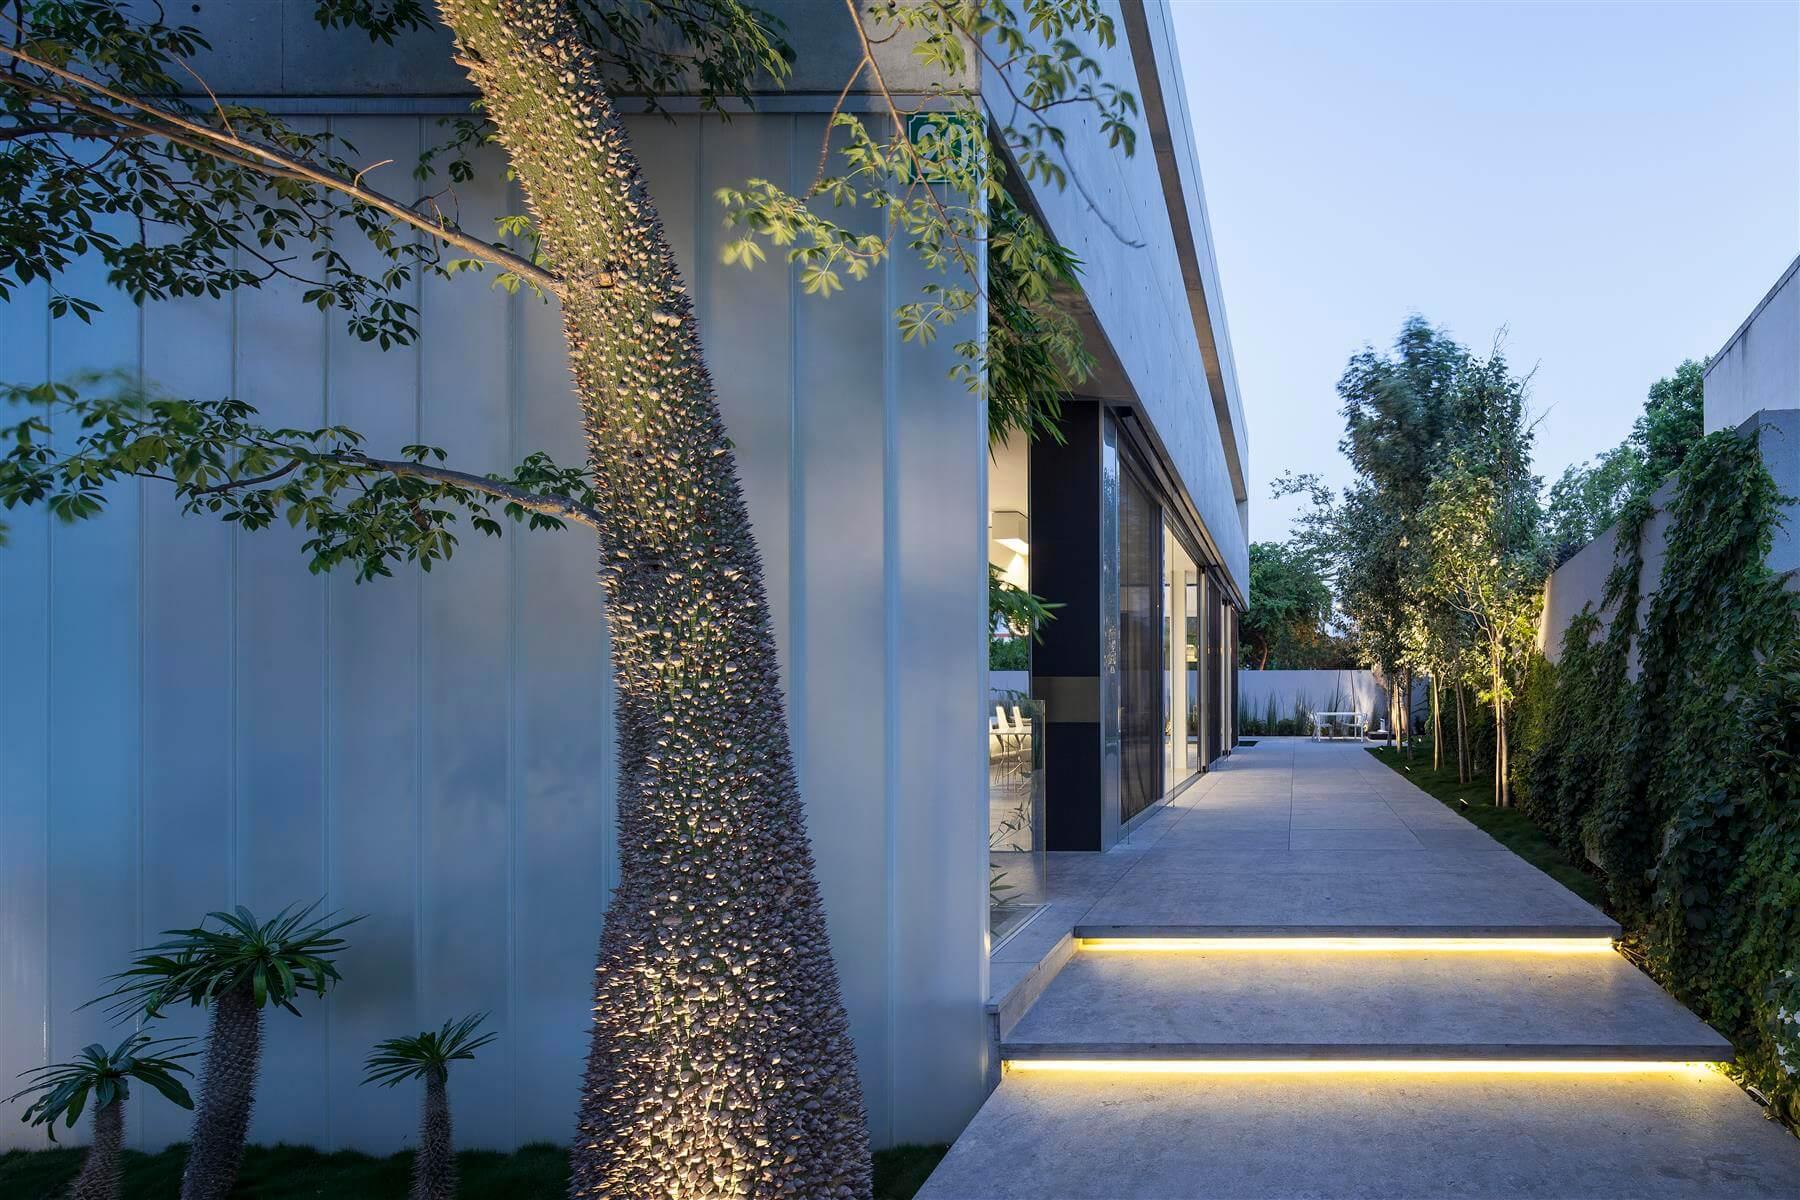 The Concrete Cut House in Ramat Gan by Pitsou Kedem Architects-15